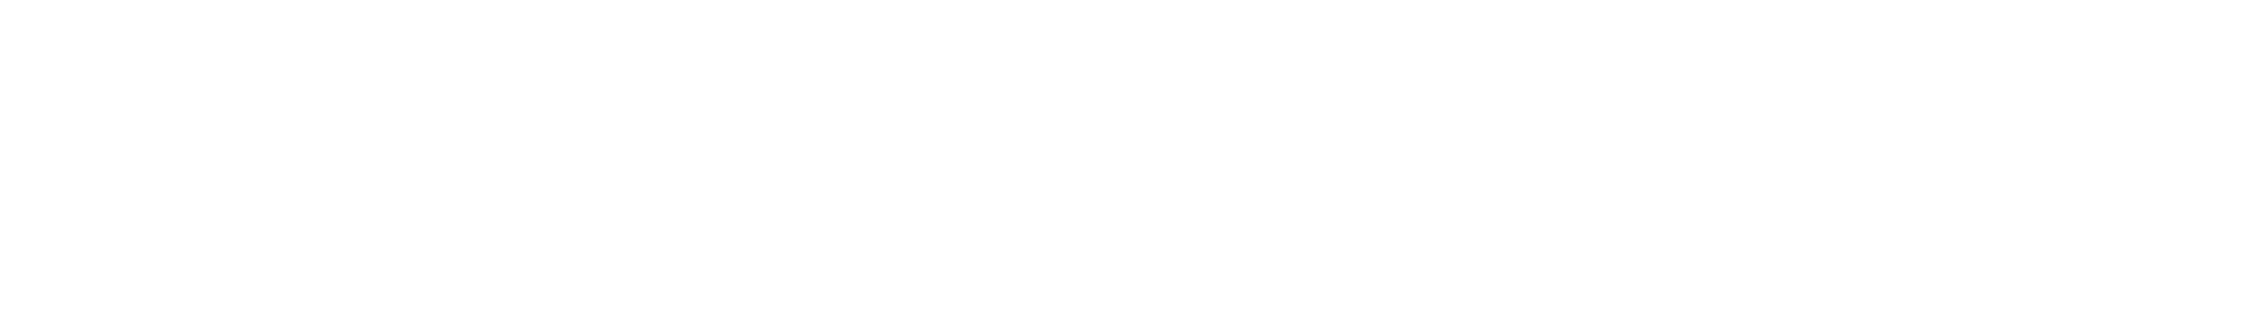 Roostify Logo White